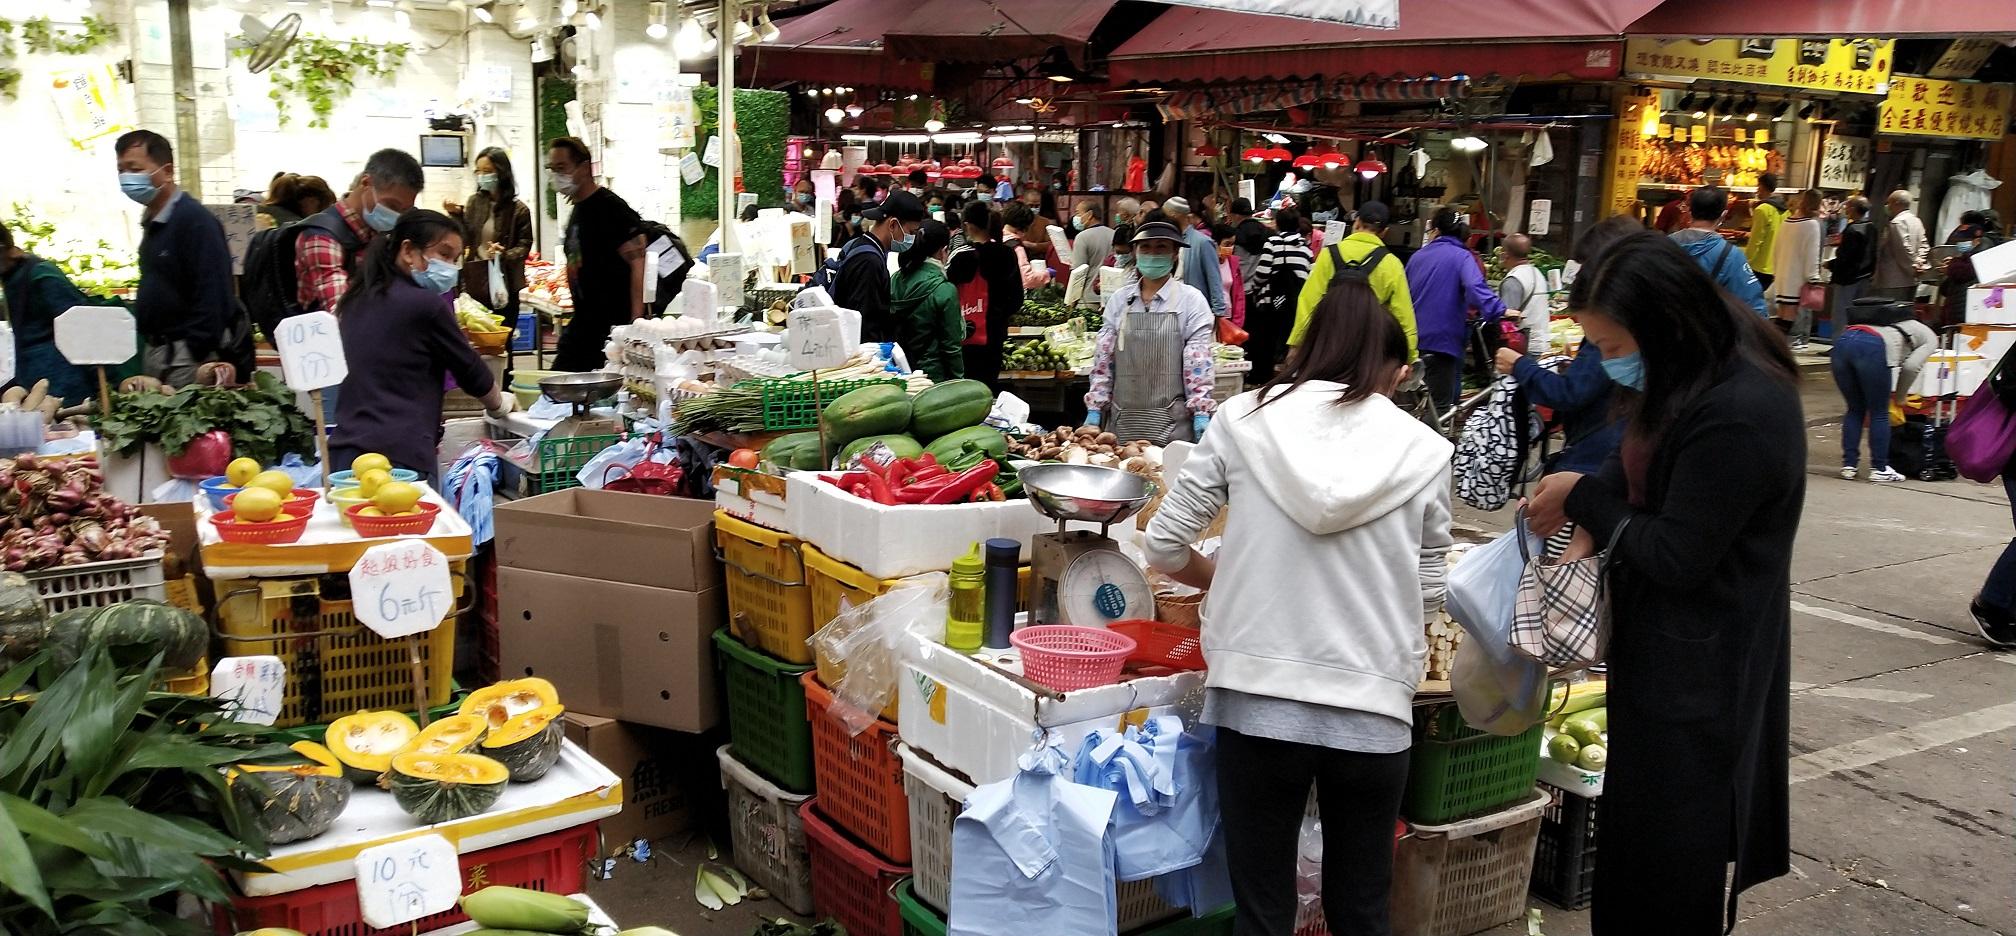 Sham Chun Street is actually a wet market.